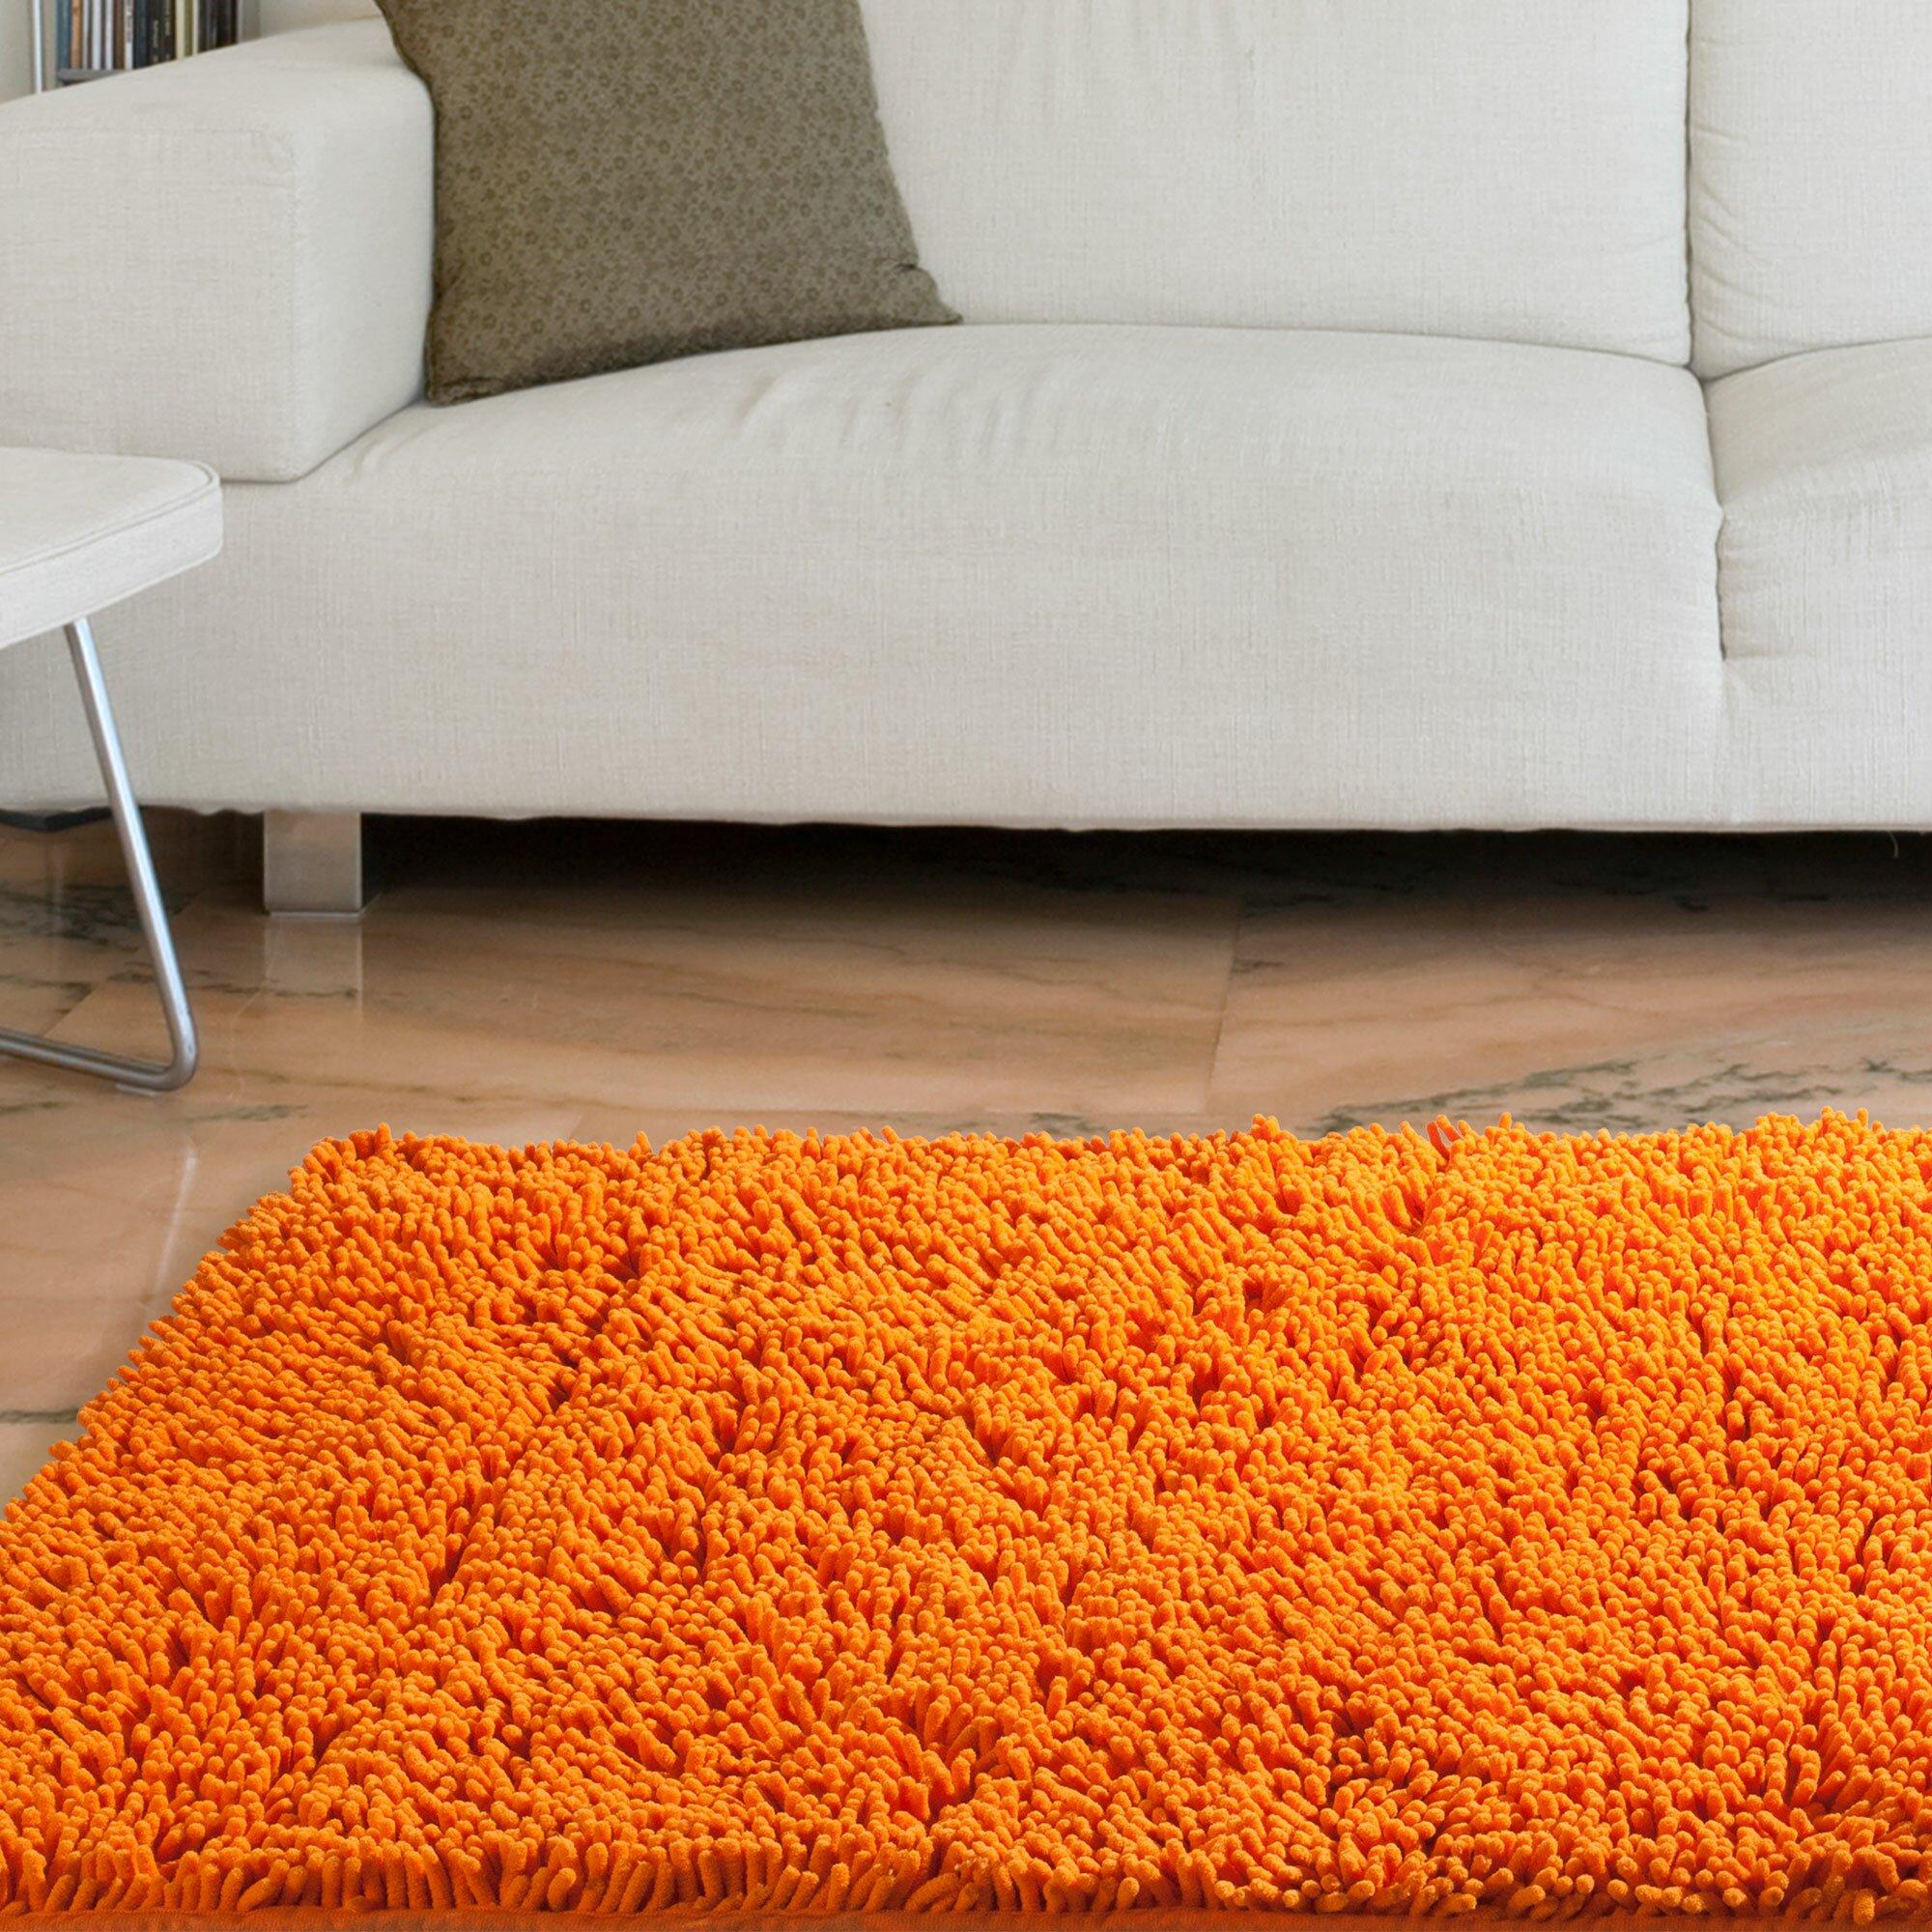 Lavish Home High Pile Orange Solid Area Rug & Reviews